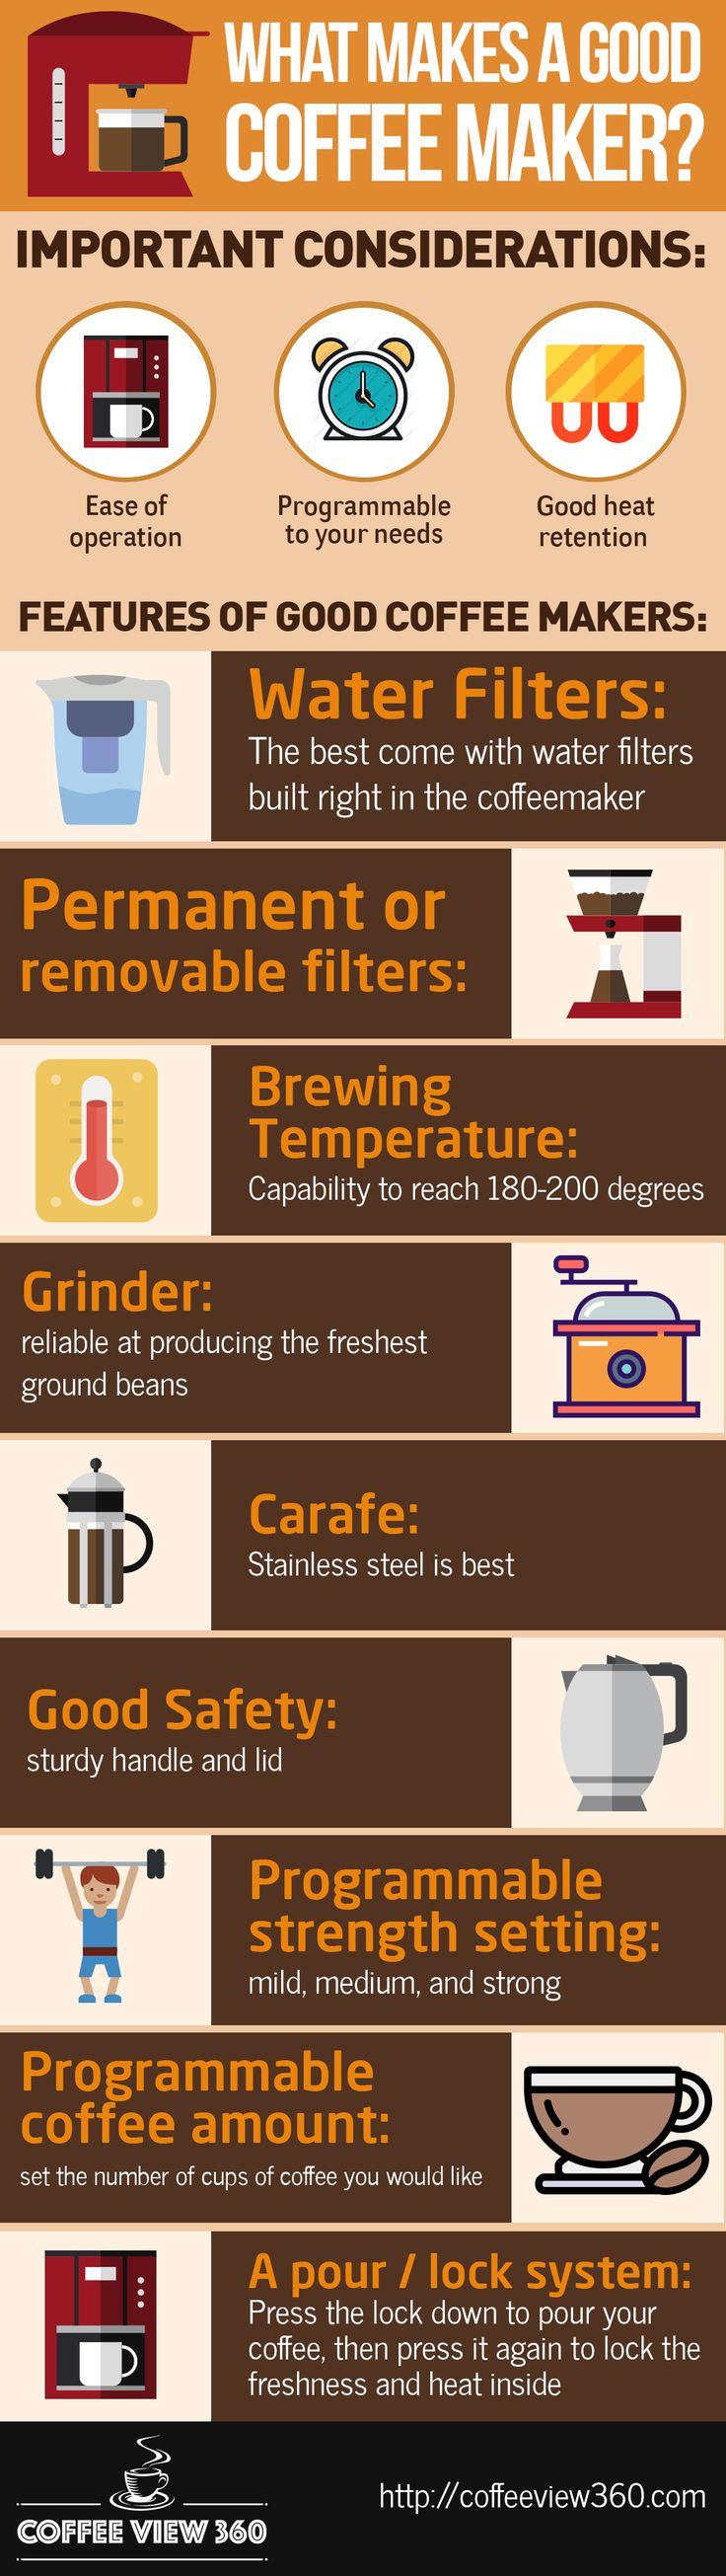 79 best Best Coffeemaker Reviews images on Pinterest ...